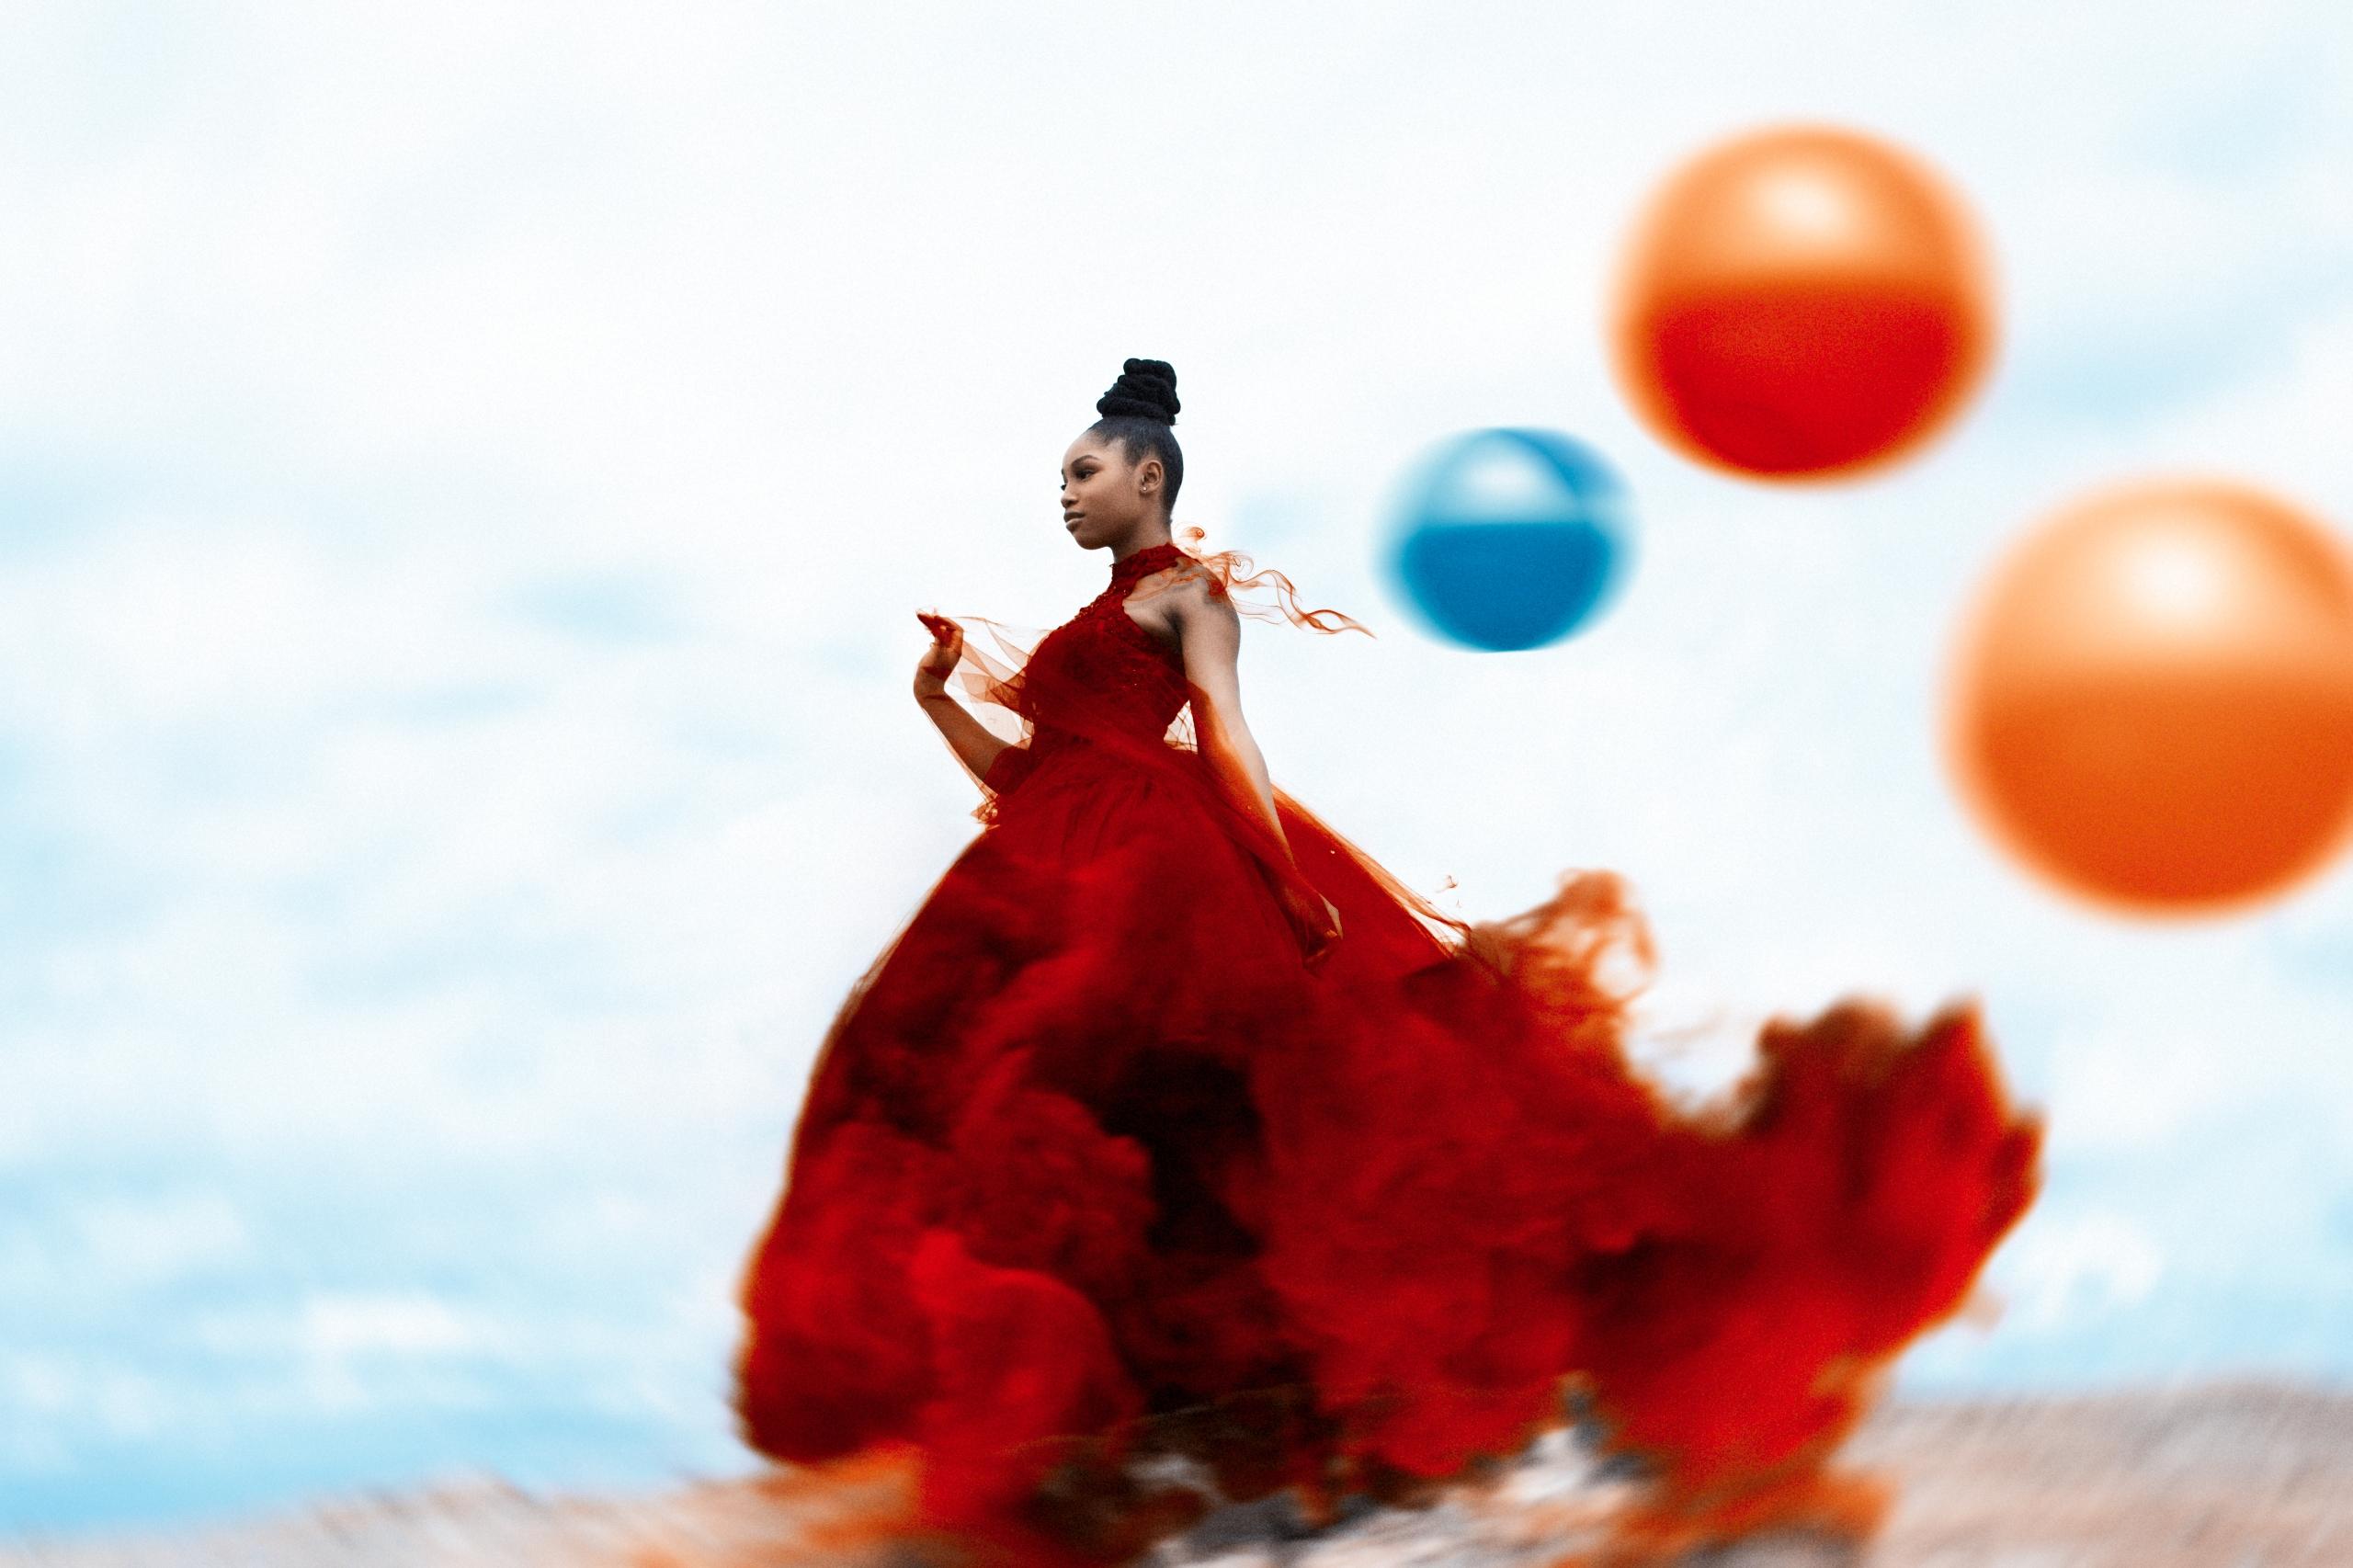 fashion Photographer flare smok - carieocrenshaw | ello